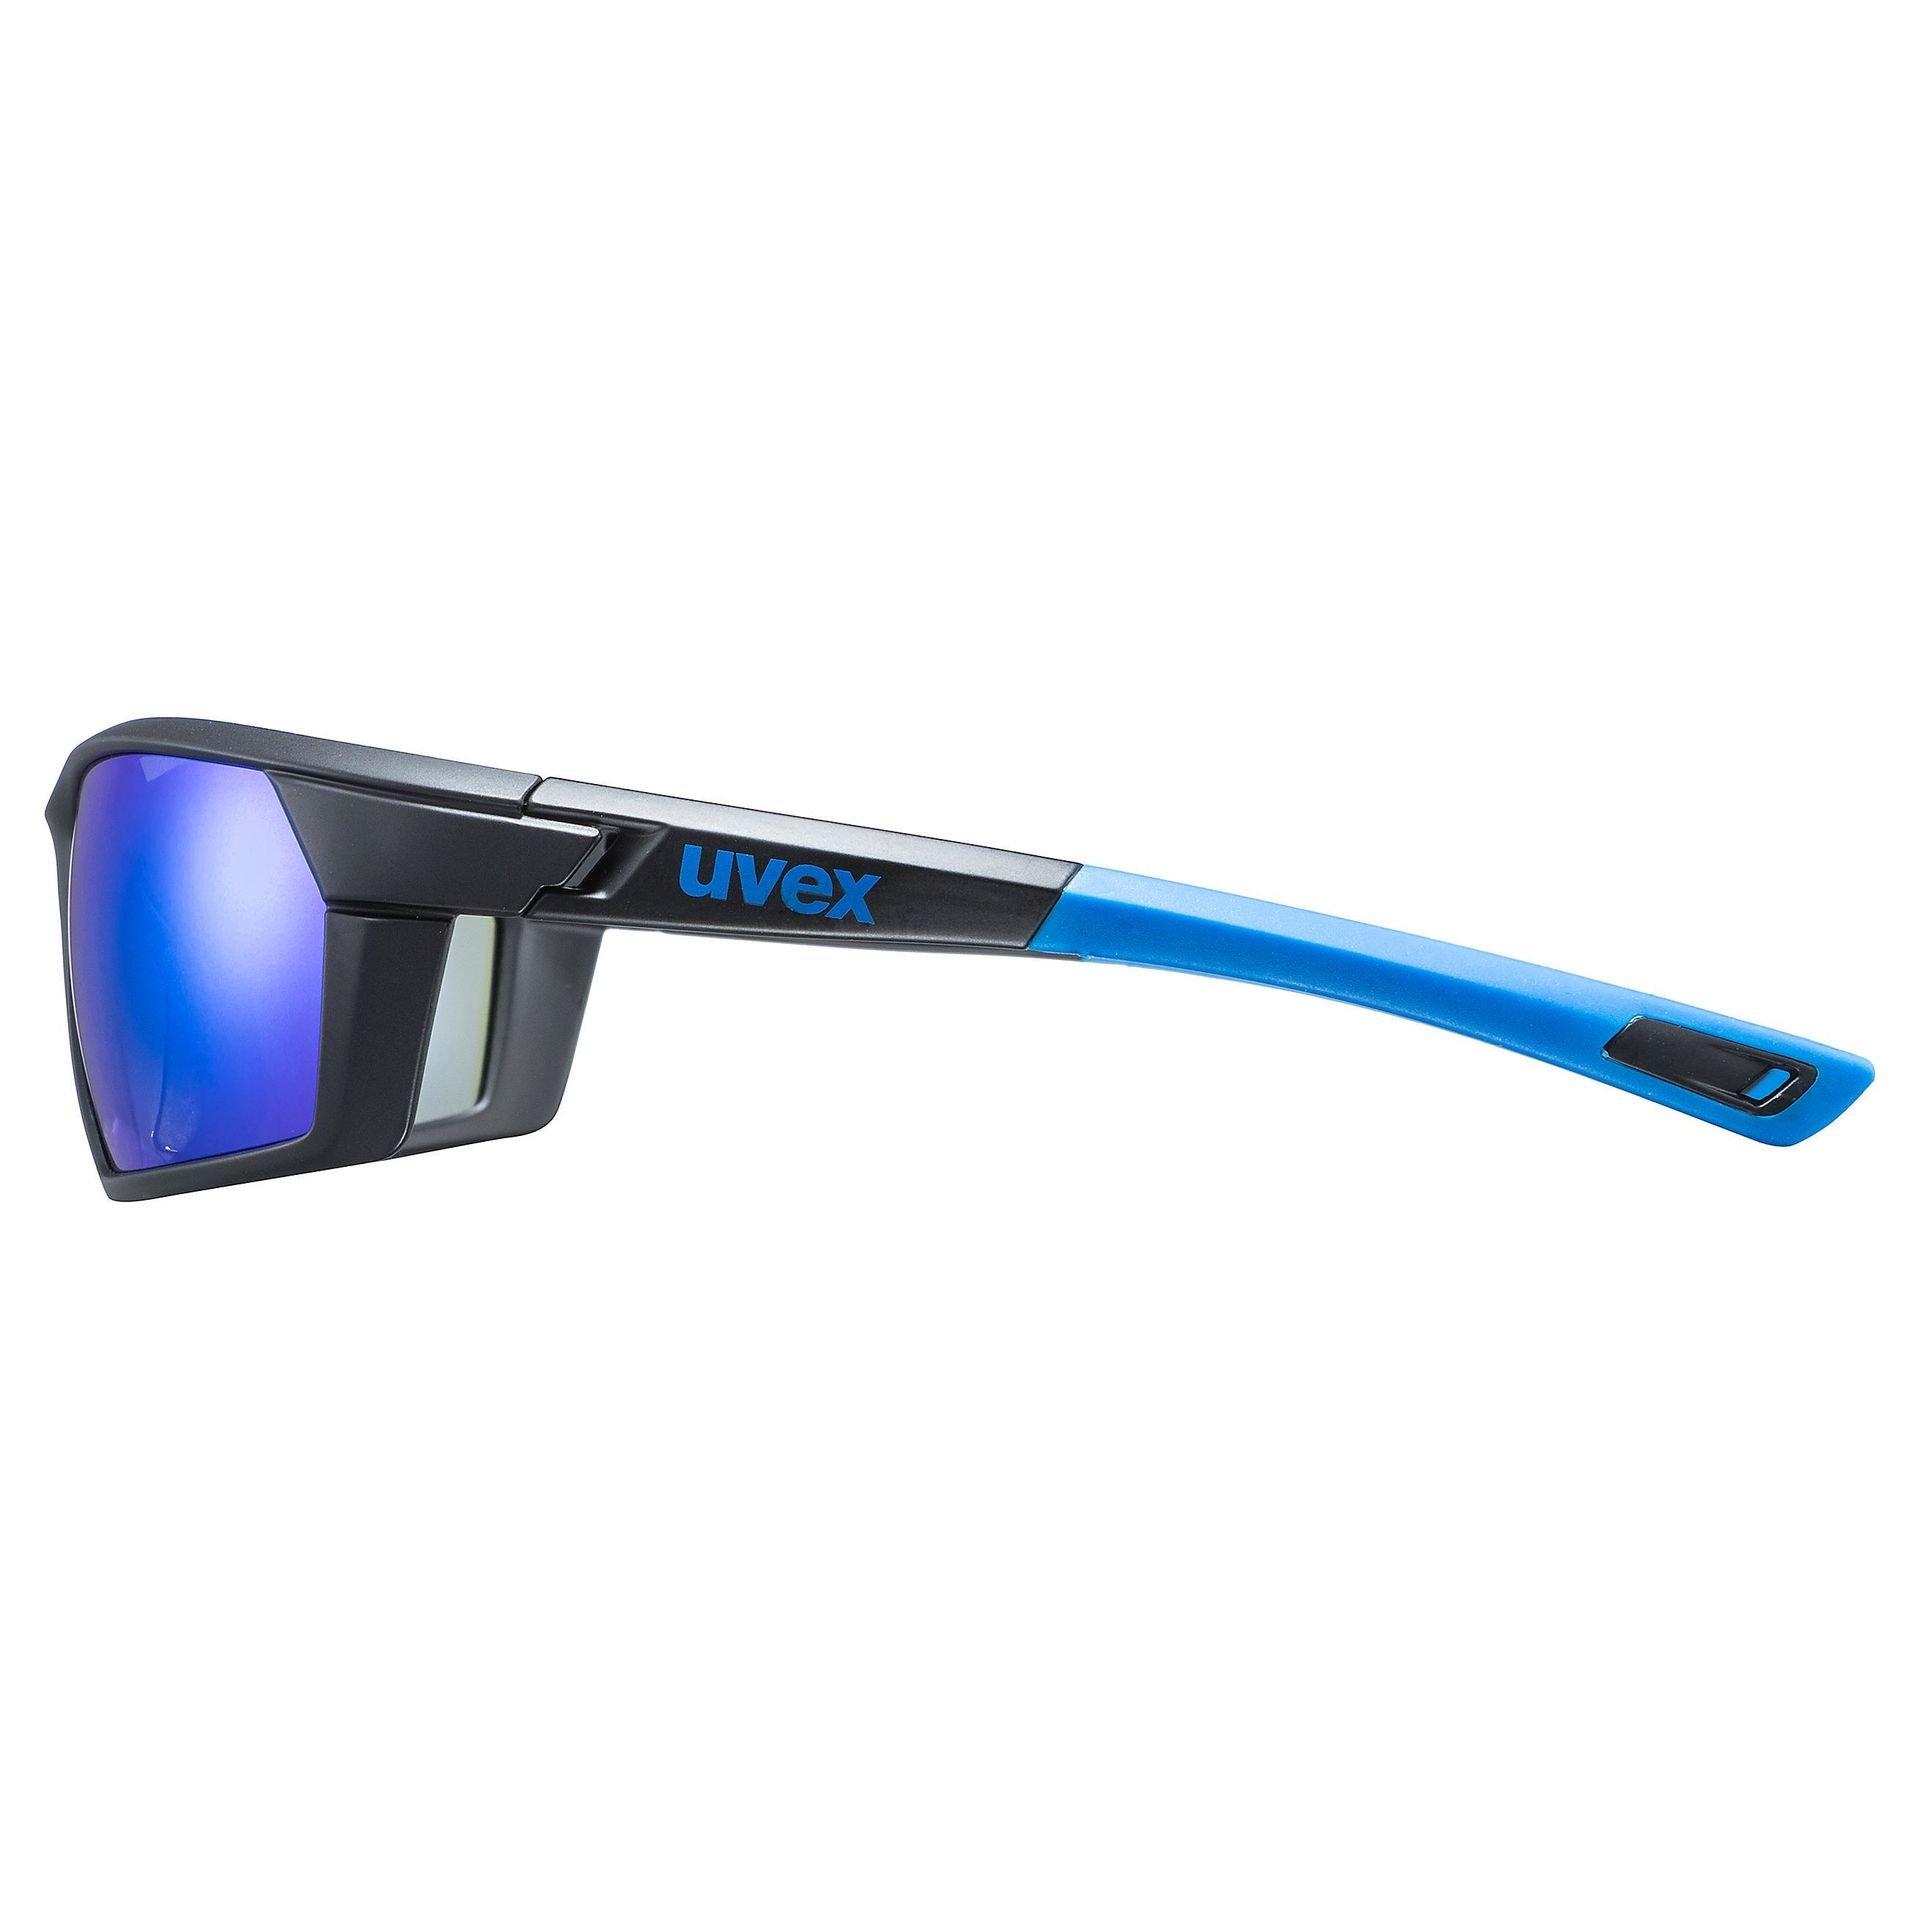 OKULARY UVEX SPORTSTYLE 225 BLACK BLUE MAT BOK